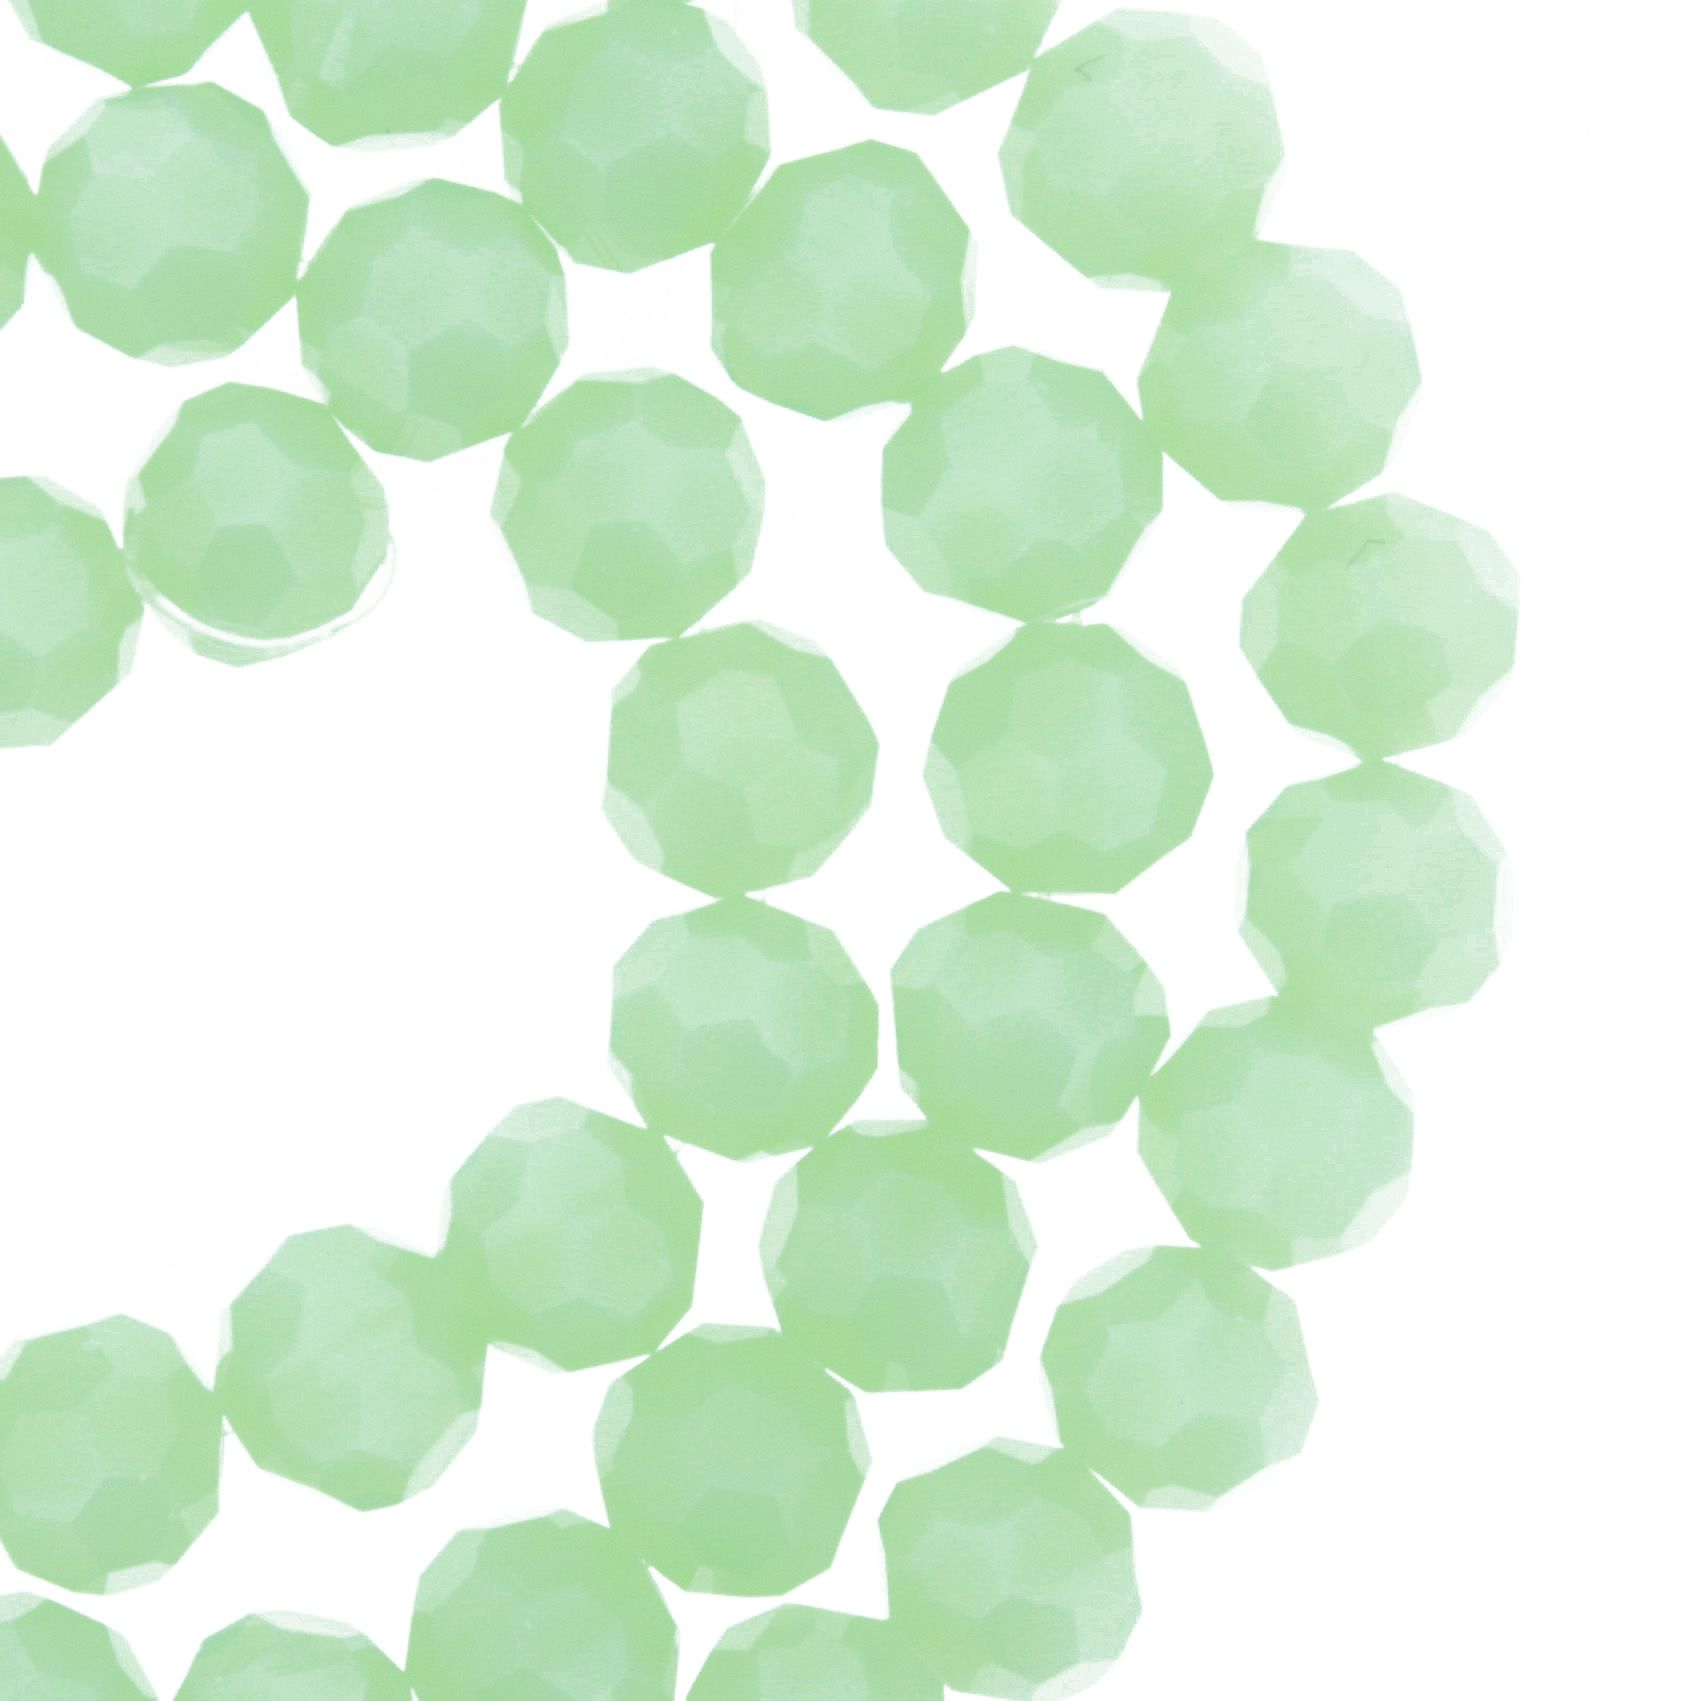 Fio de Cristal - Bello® - Verde Claro - 8mm  - Universo Religioso® - Artigos de Umbanda e Candomblé